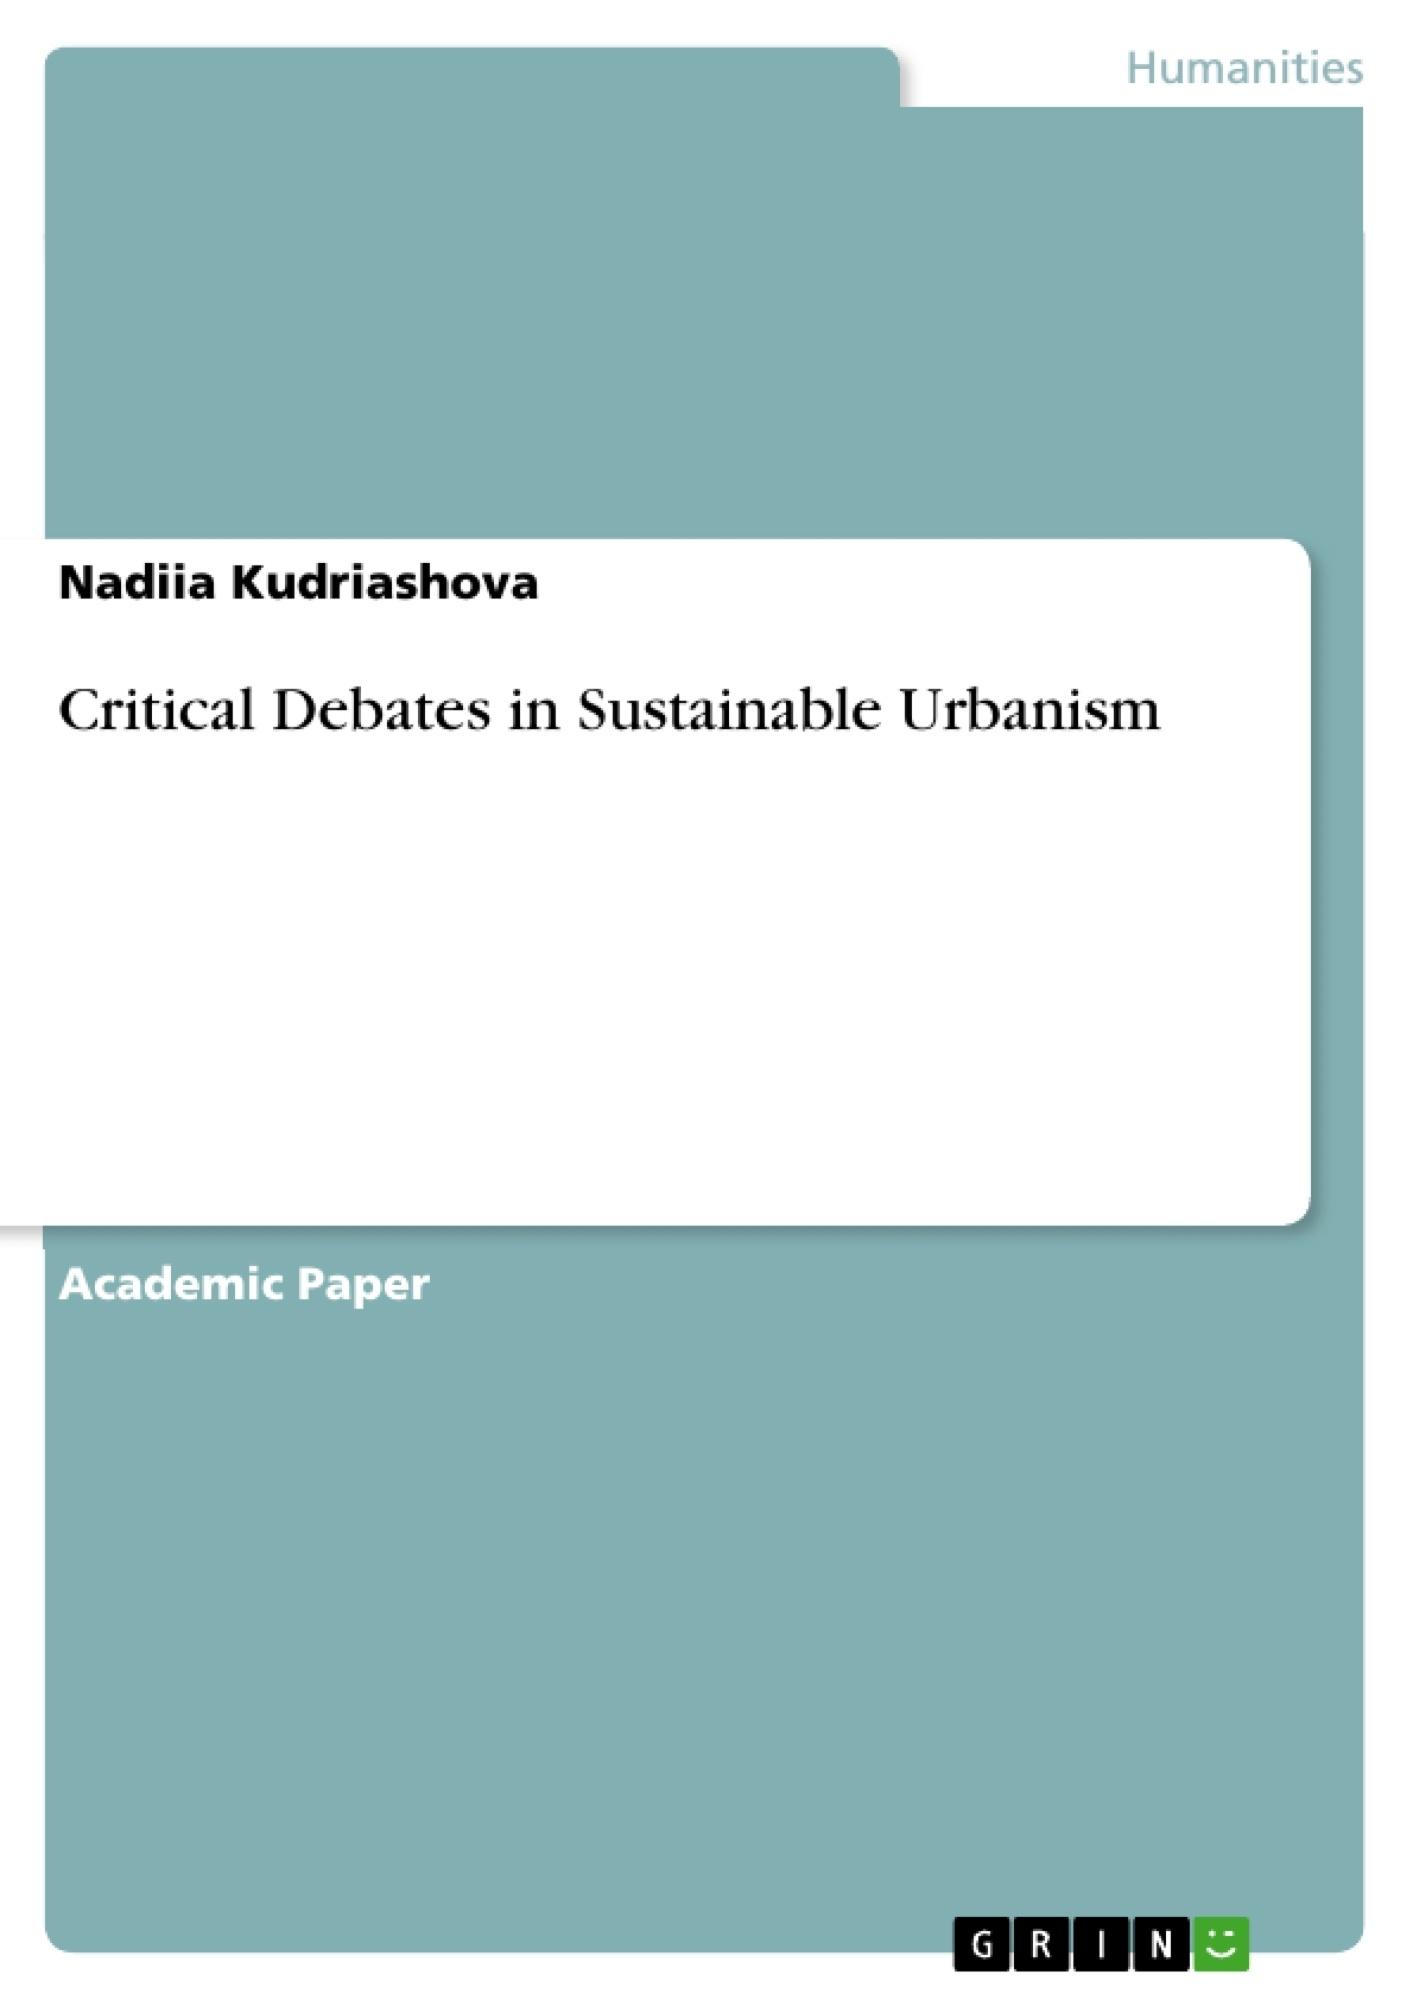 Title: Critical Debates in Sustainable Urbanism